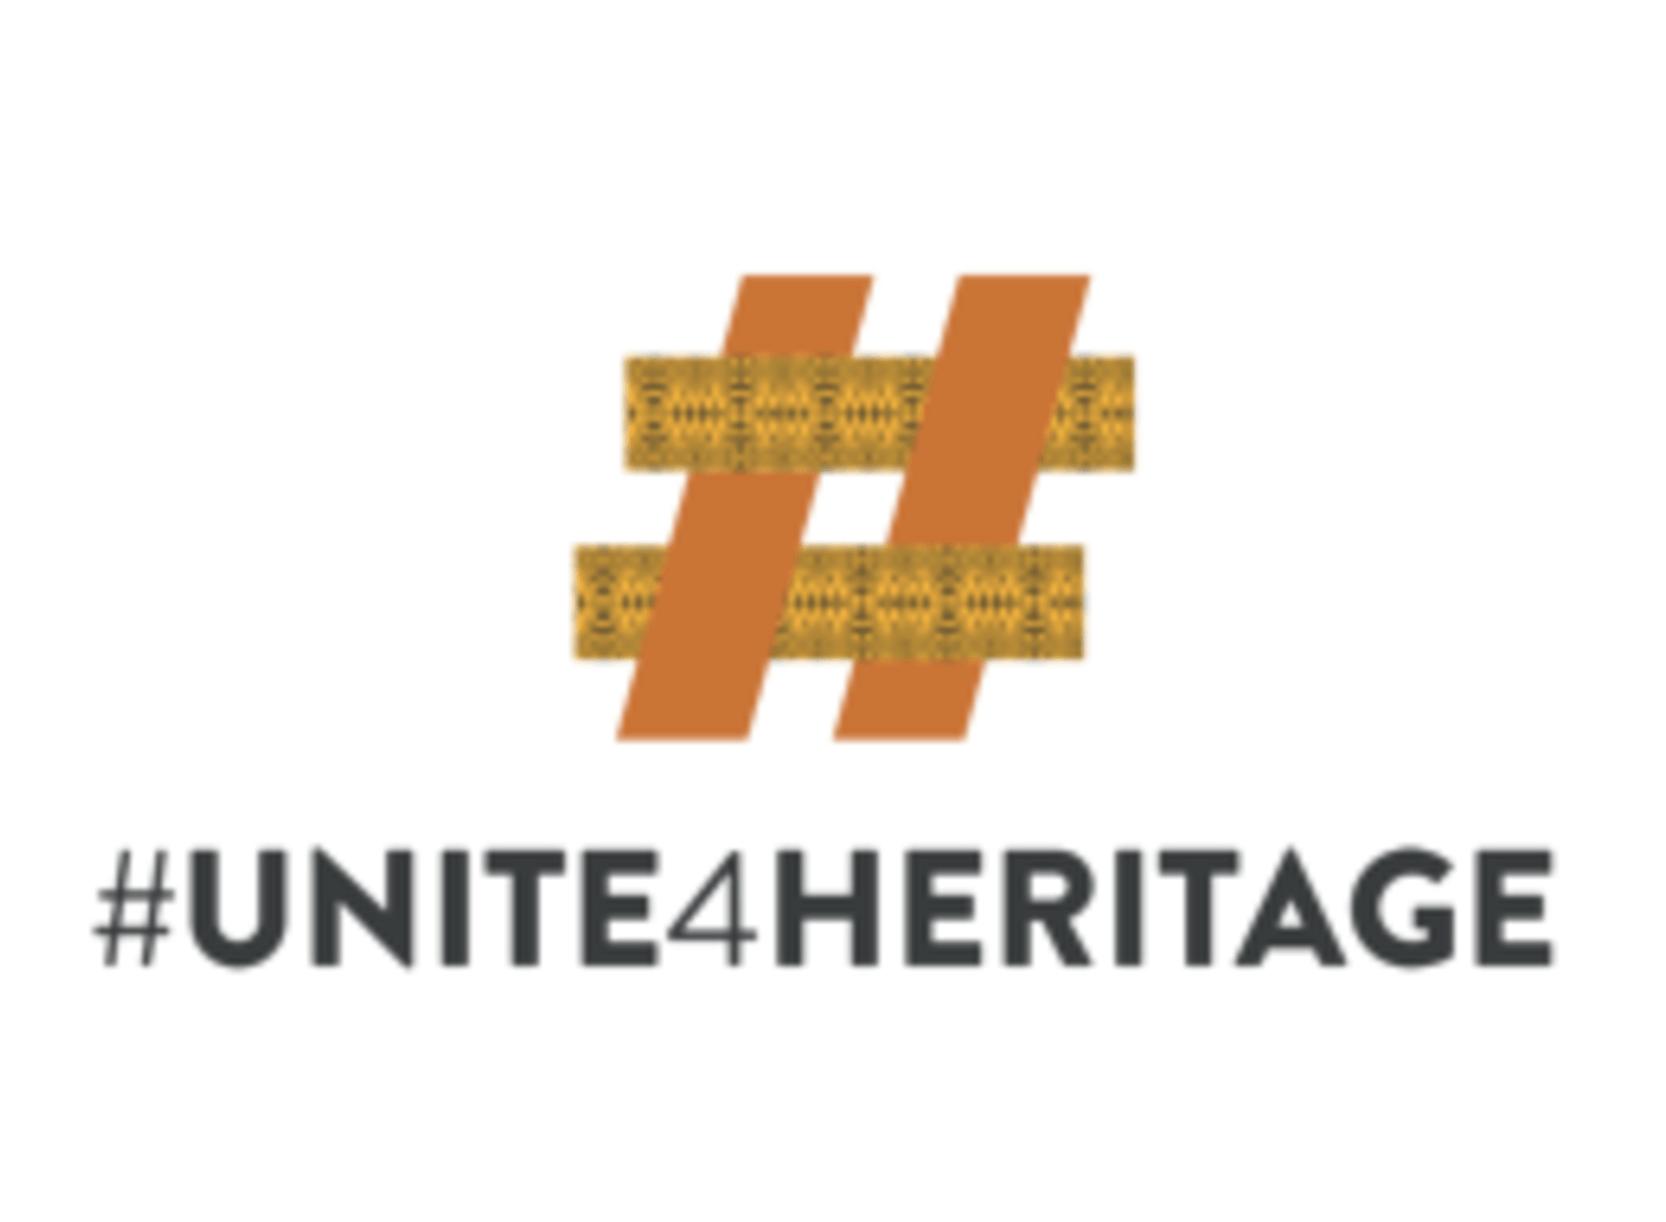 Unite4heritage Antiquities Coalition